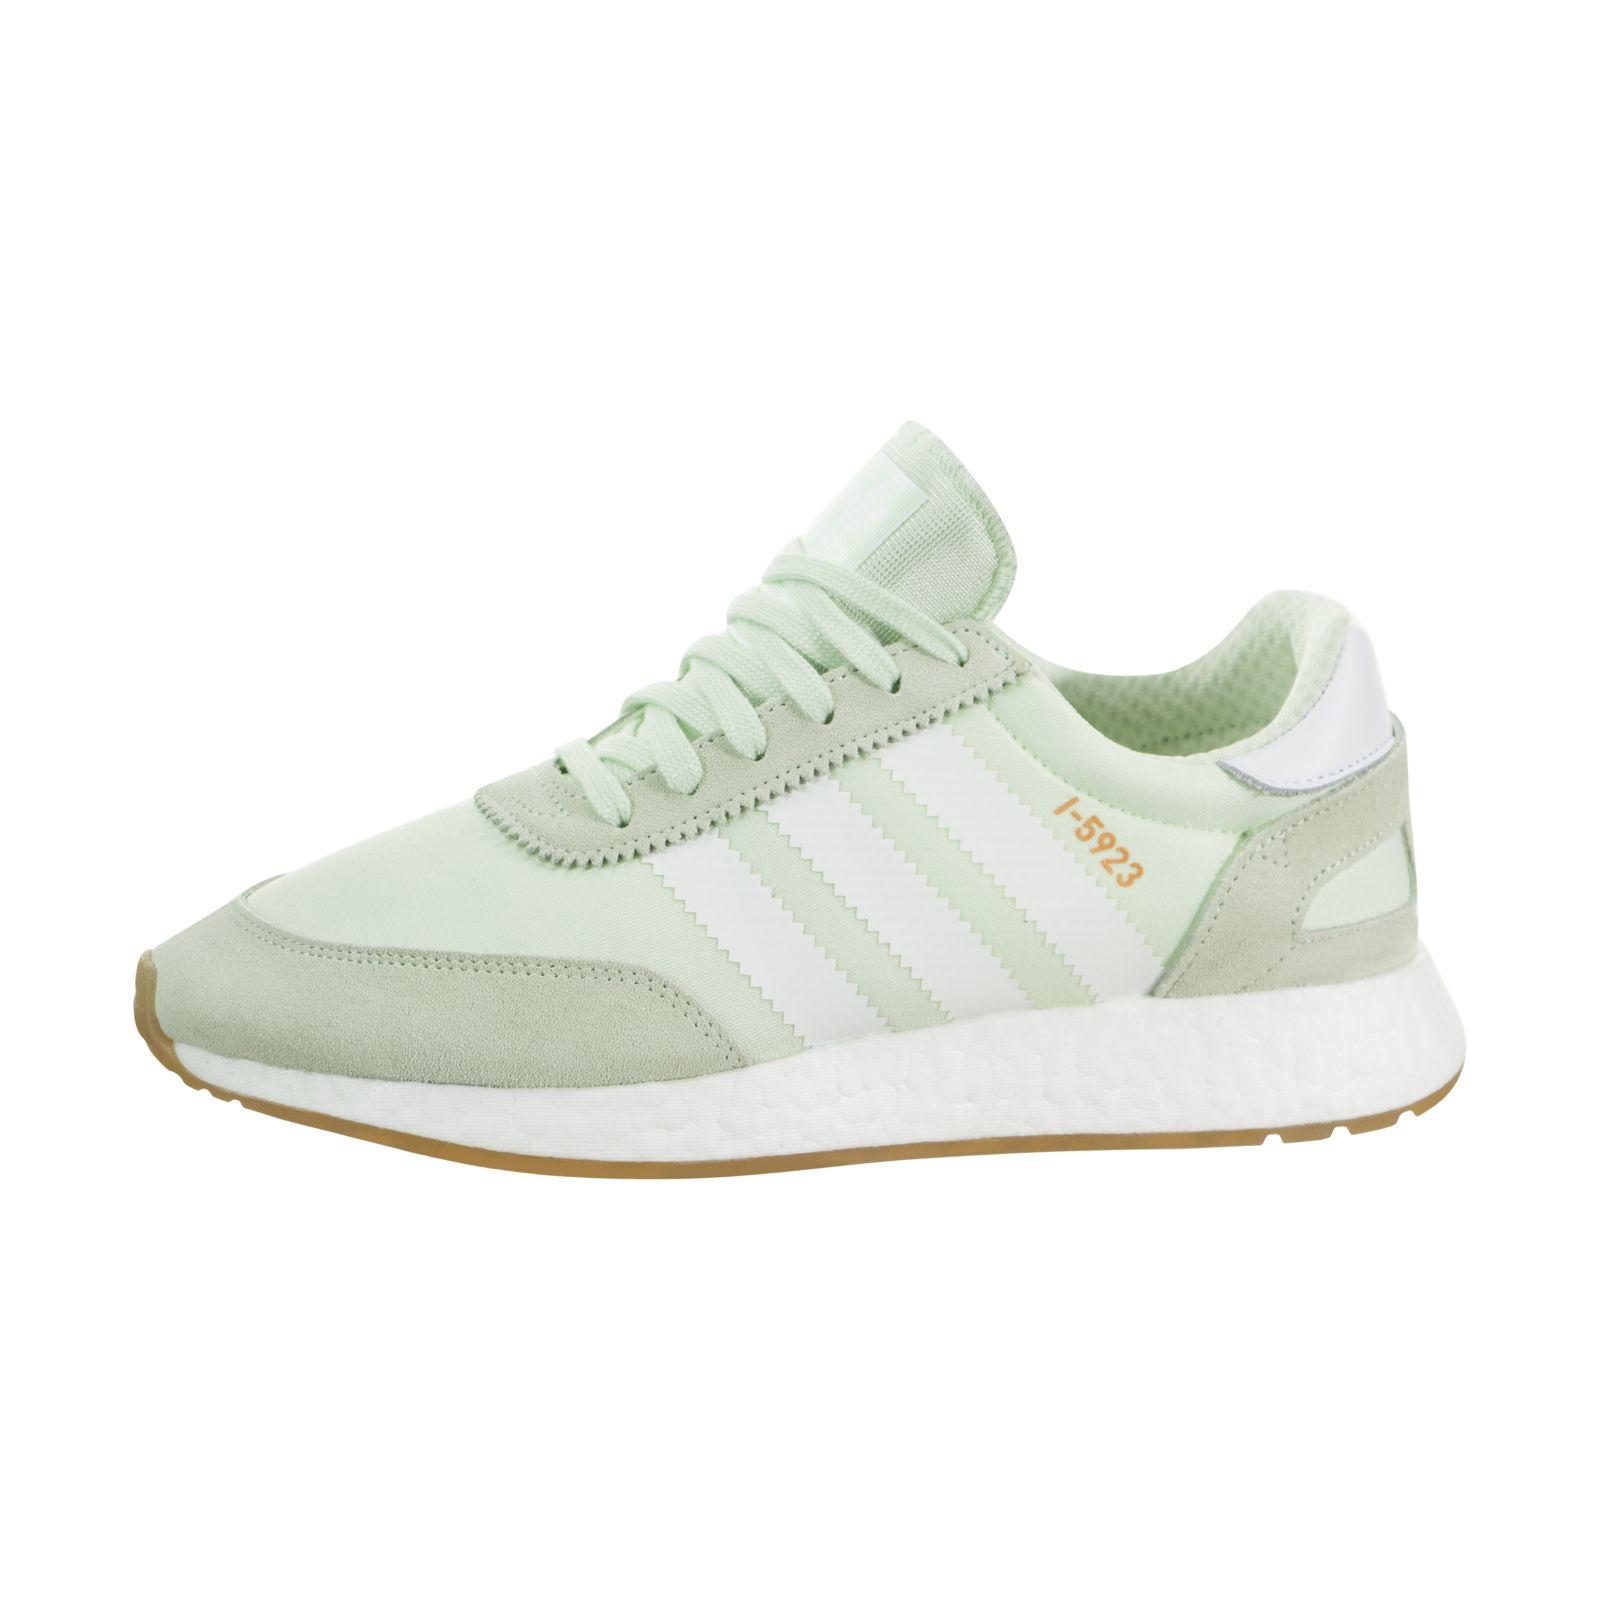 adidas I 5923 Iniki Runner Boost Aero Green White Cq2530 Womens Size 10